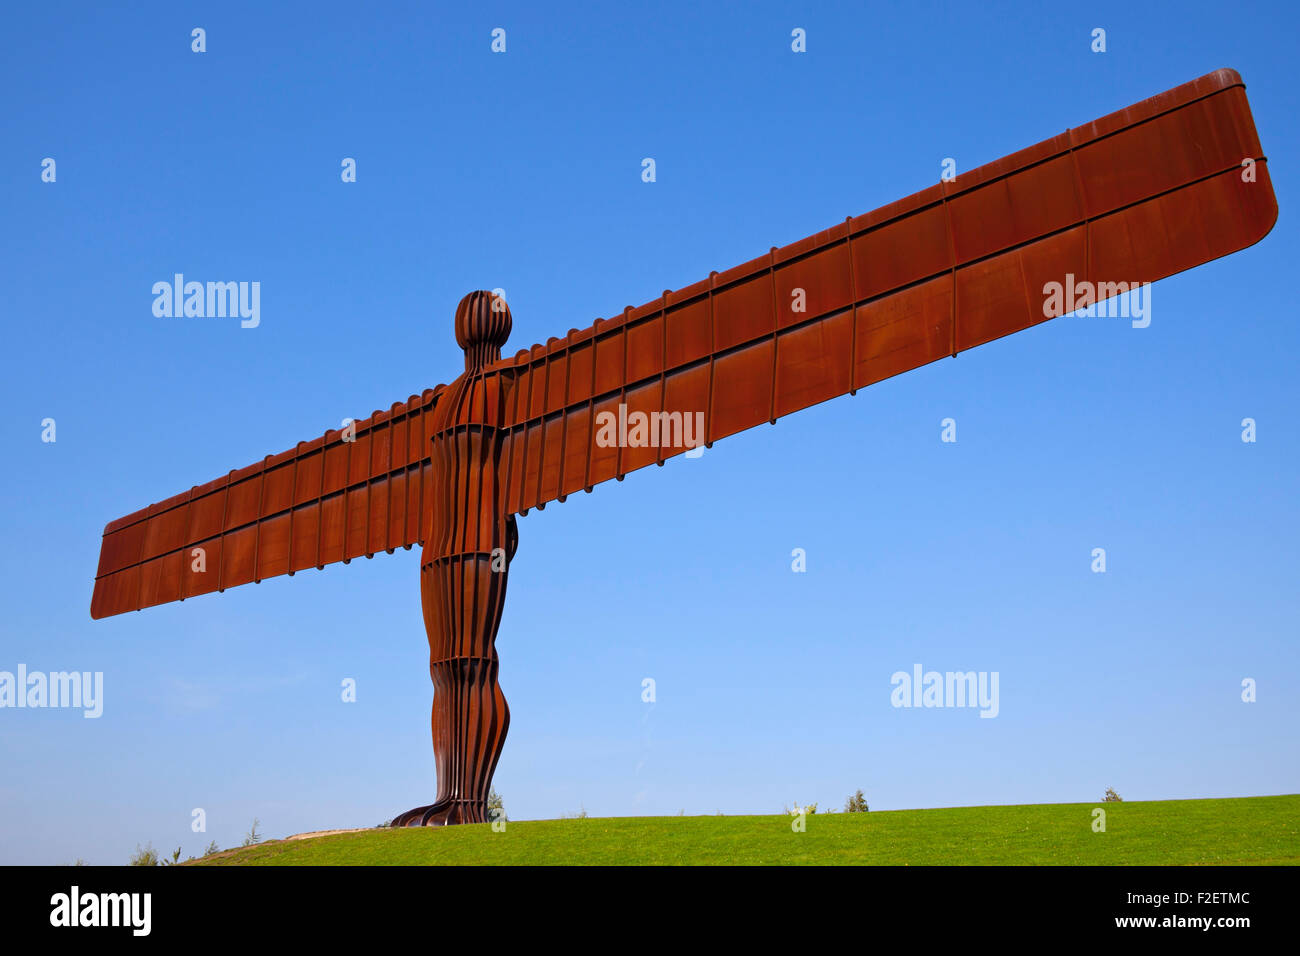 Statue Angel of the North, Gateshead Newcastle, UK Europe Photo Stock